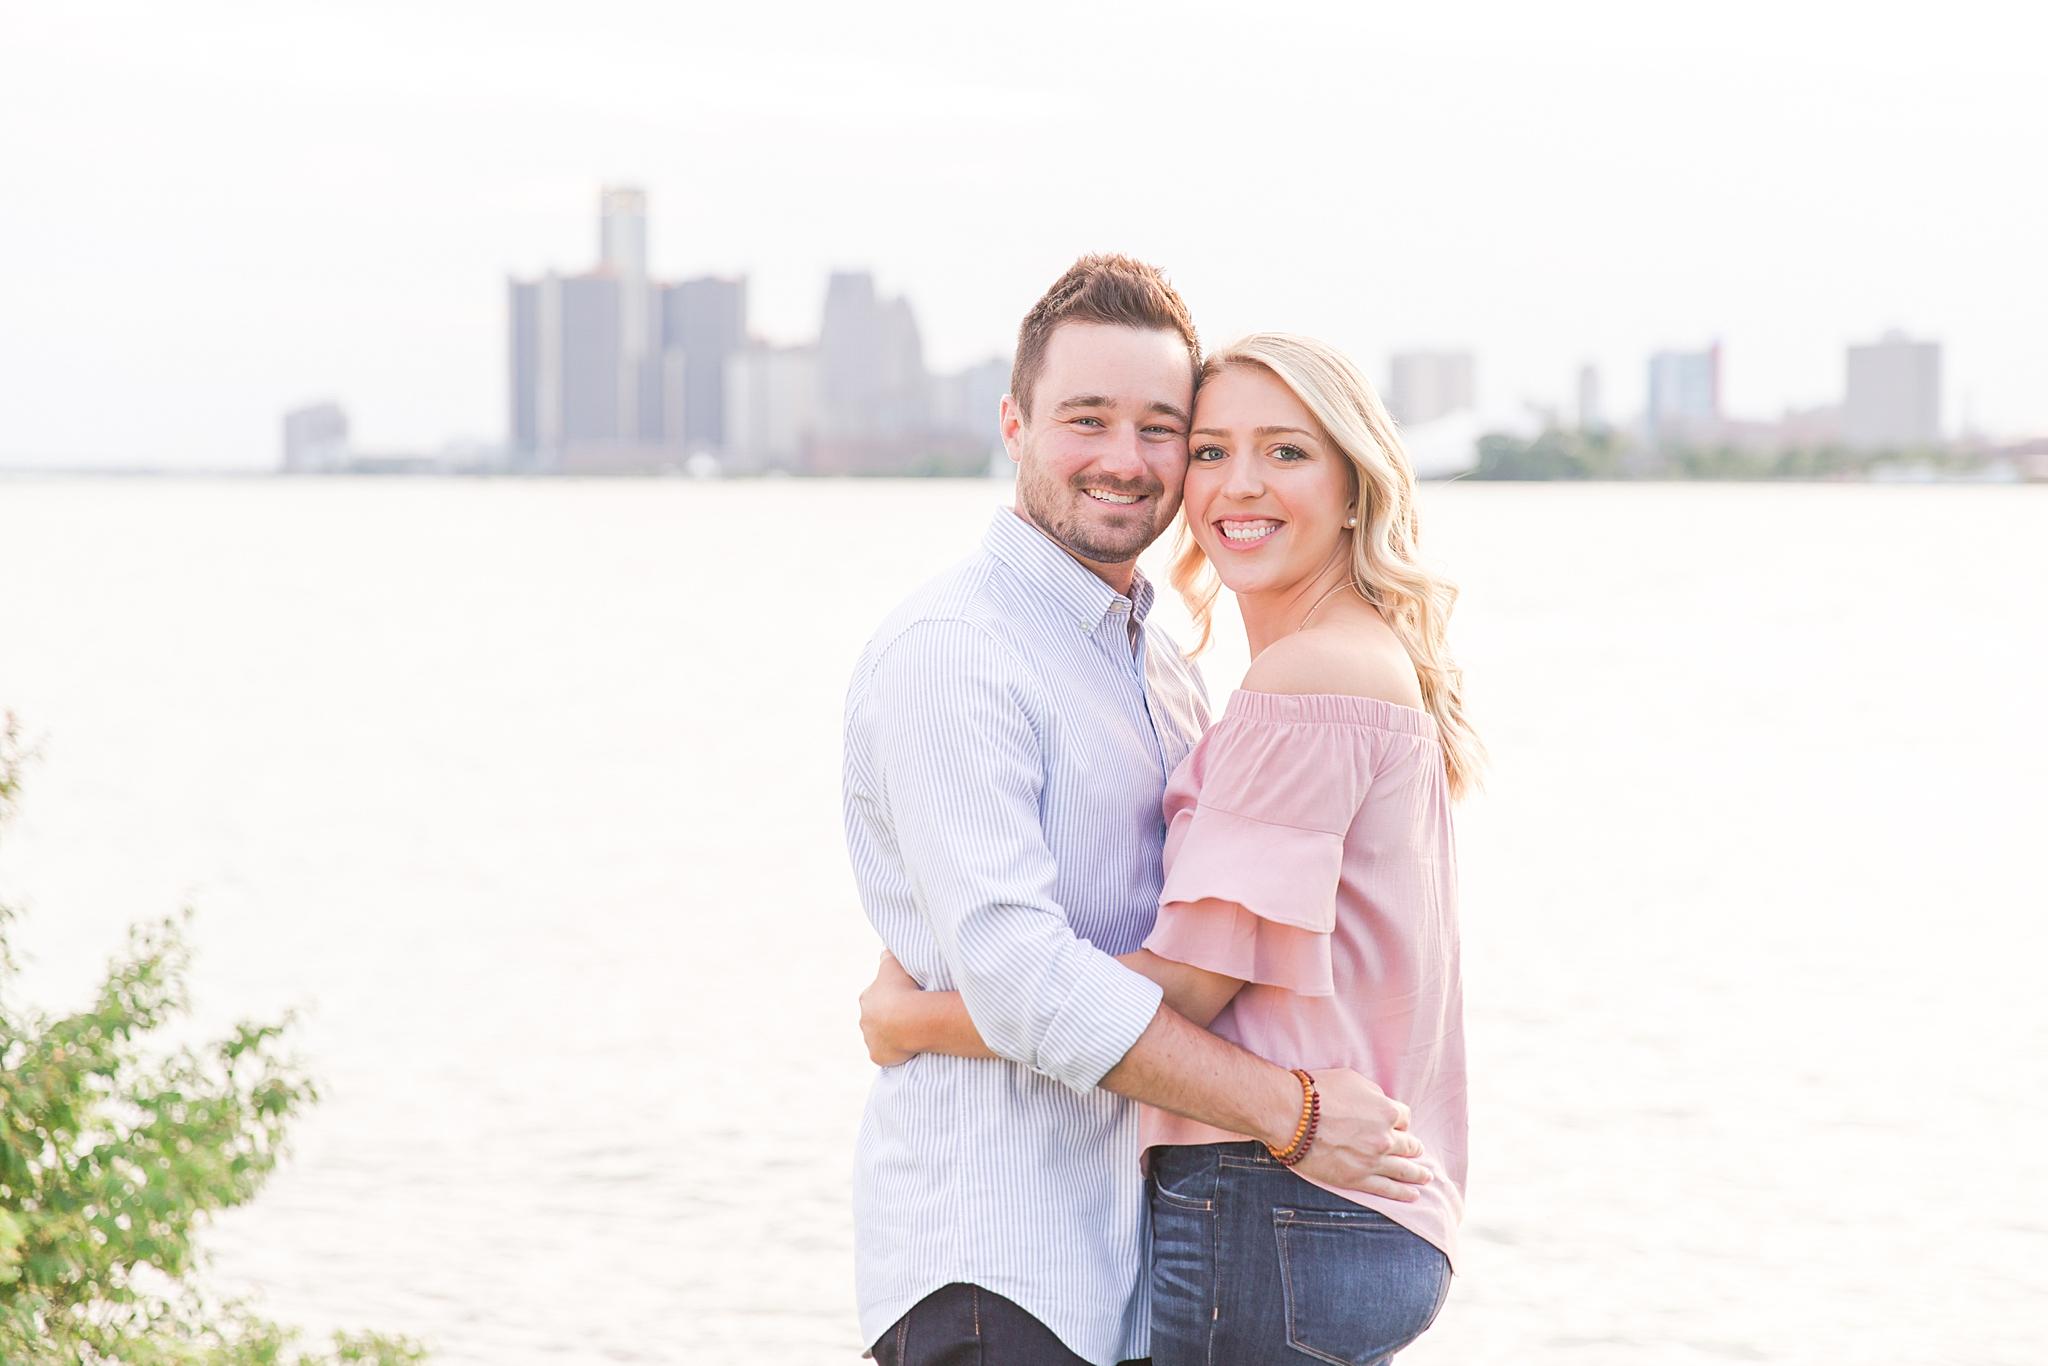 detroit-wedding-photographer-downtown-detroit-belle-isle-engagement-photos-sarah-eric-by-courtney-carolyn-photography_0038.jpg